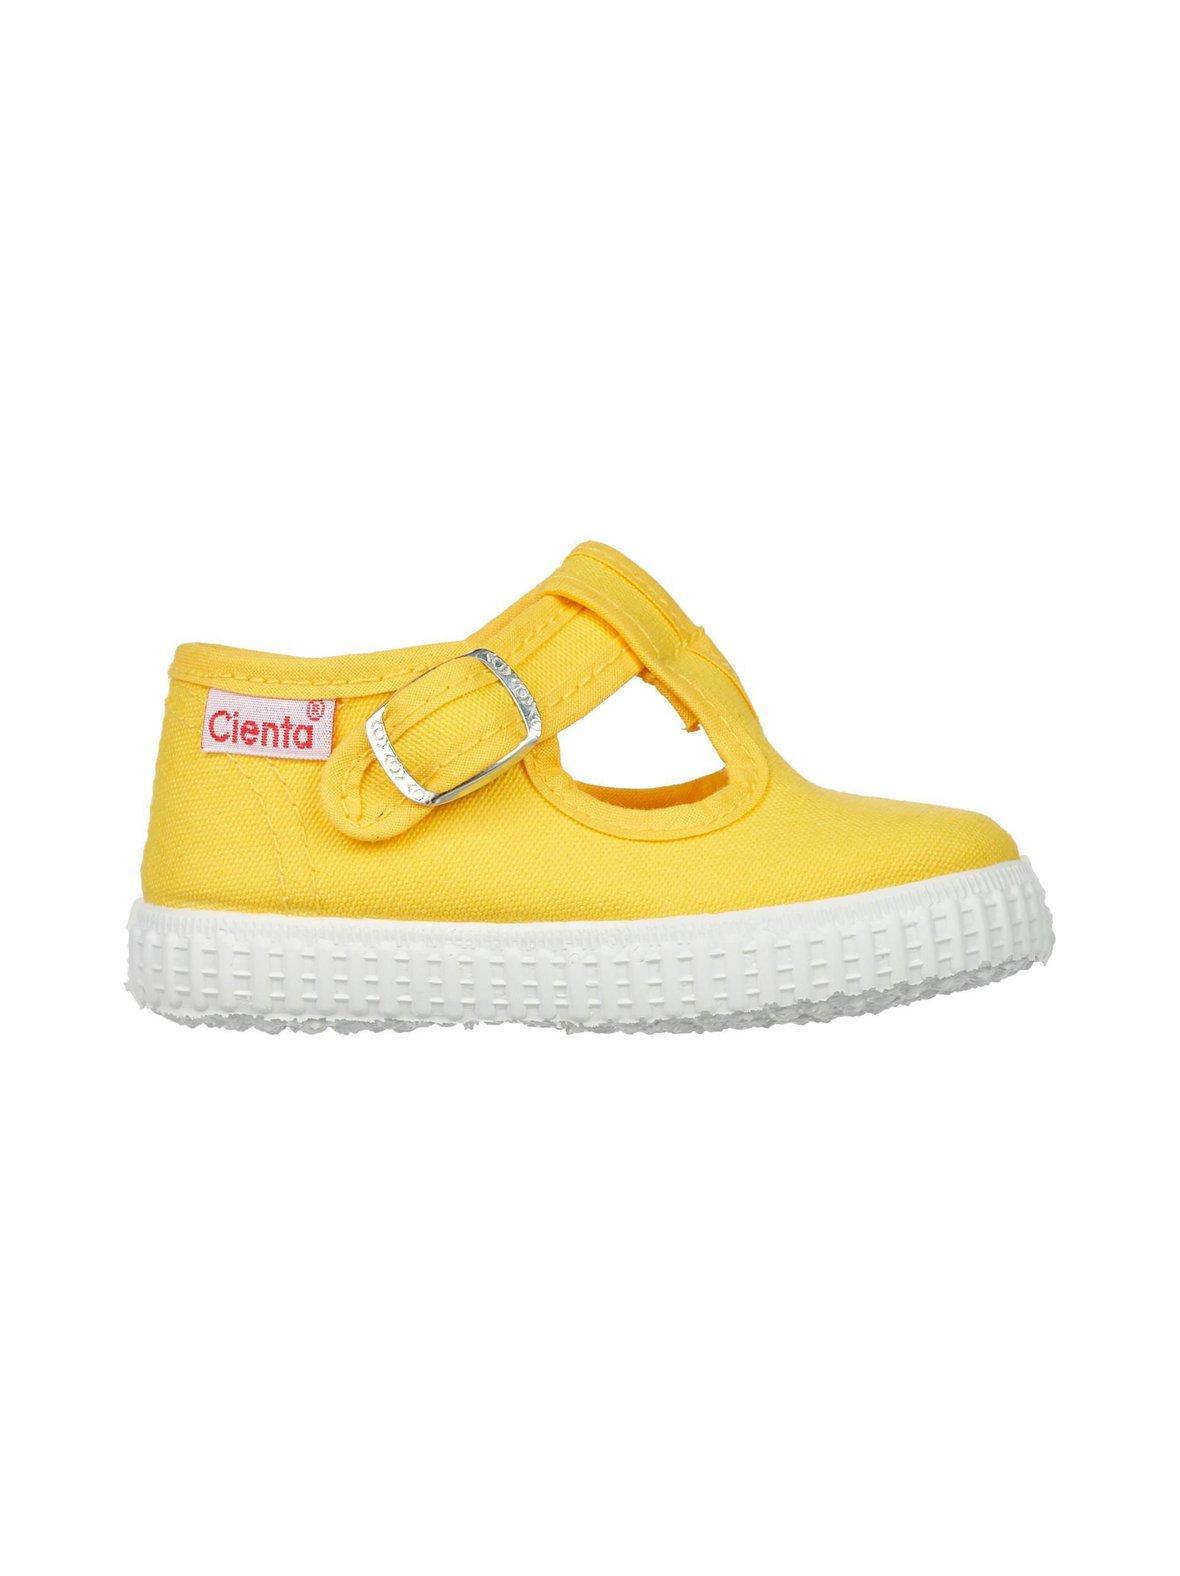 Amarillo (keltainen) CIENTA Kengät 51  5f000484ba